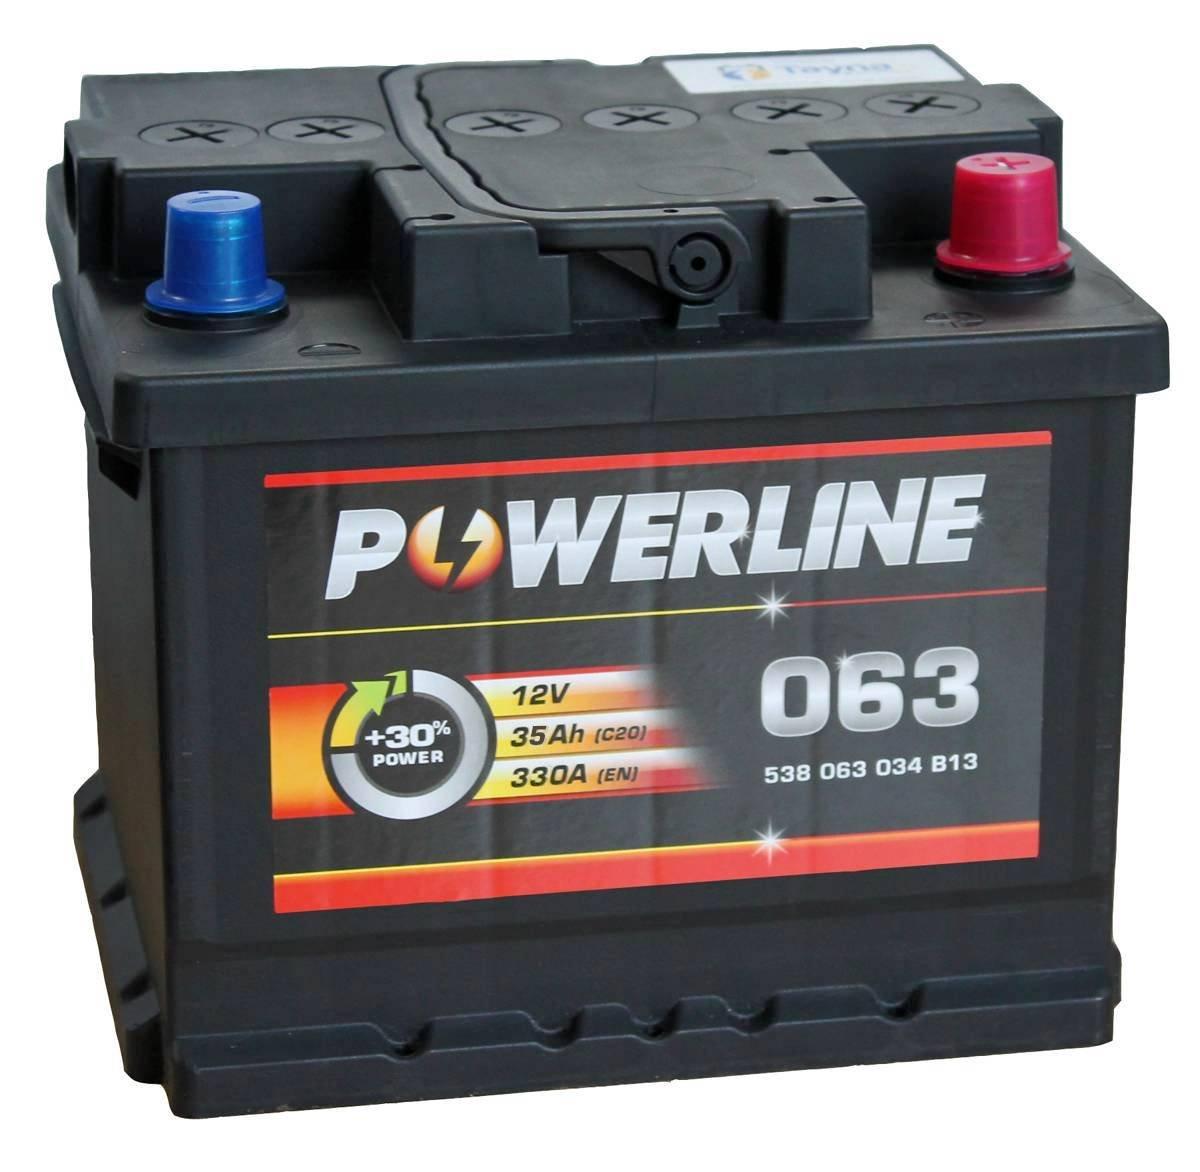 063 Powerline Batterie de Voiture 12V